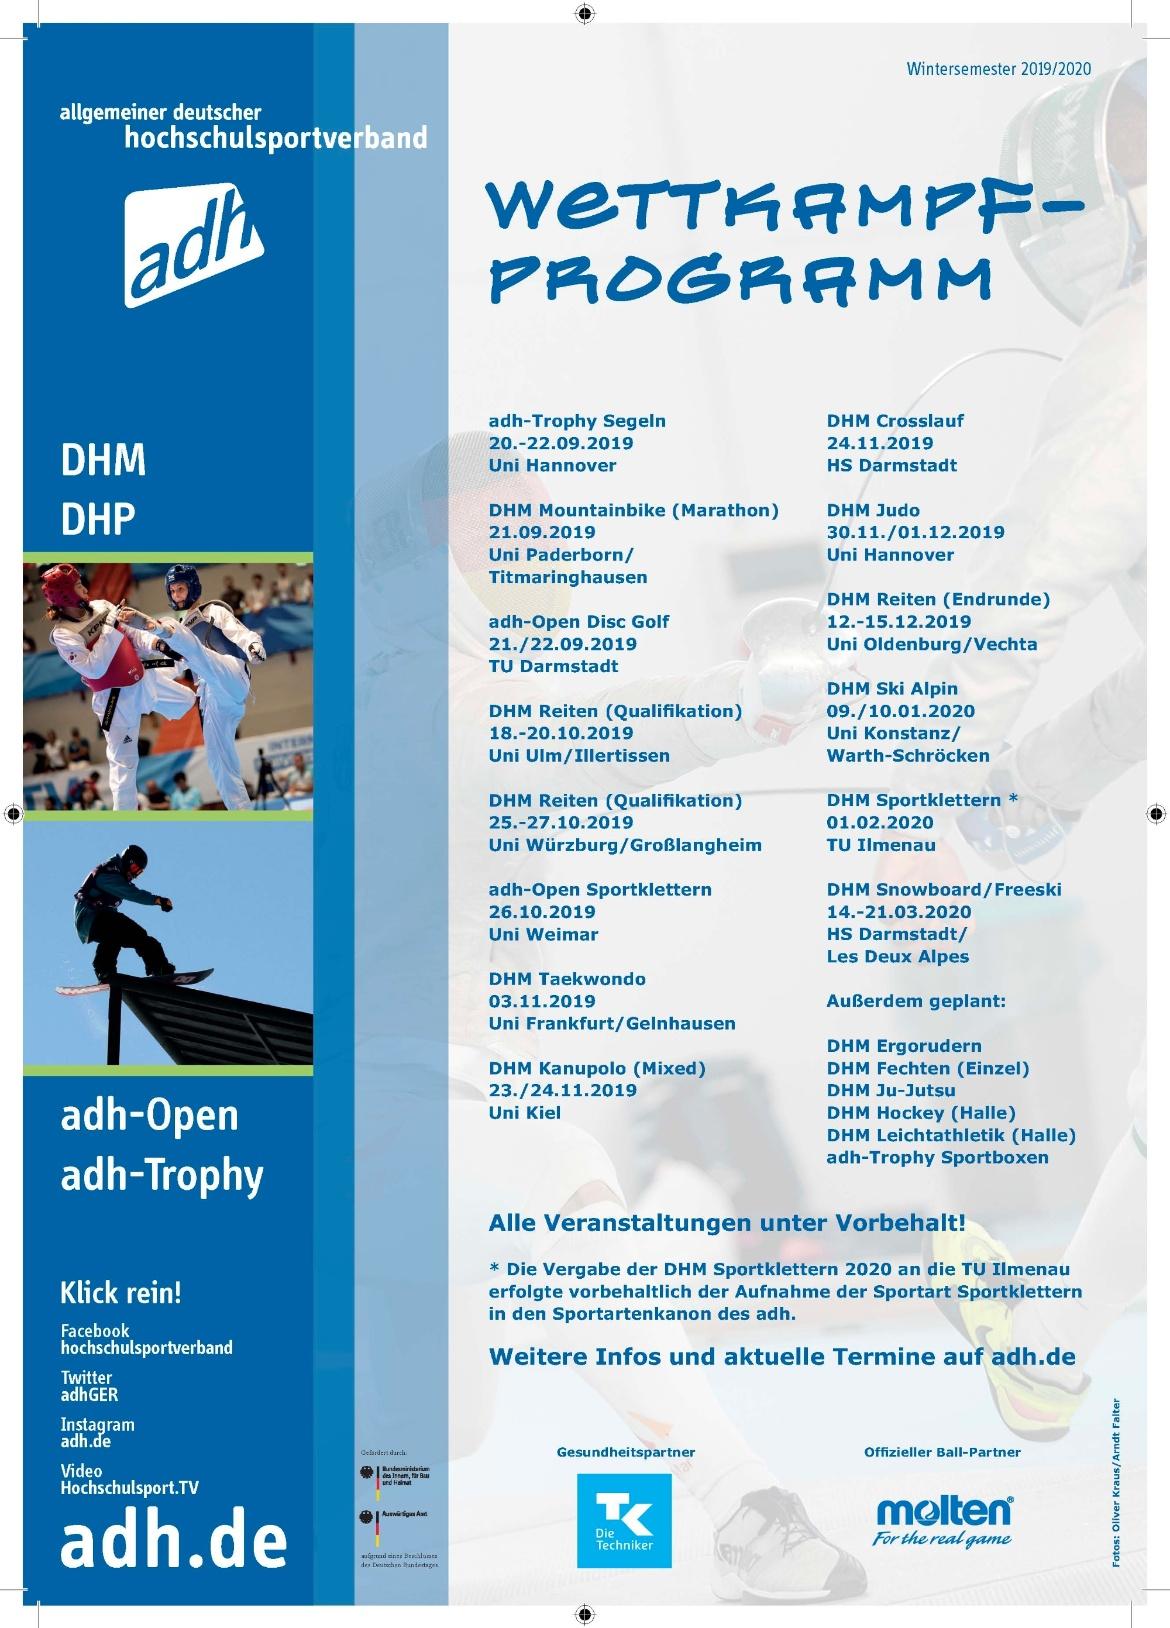 Aktuelles Wettkampfprogramm Wintersemester 2019/2020 (c)